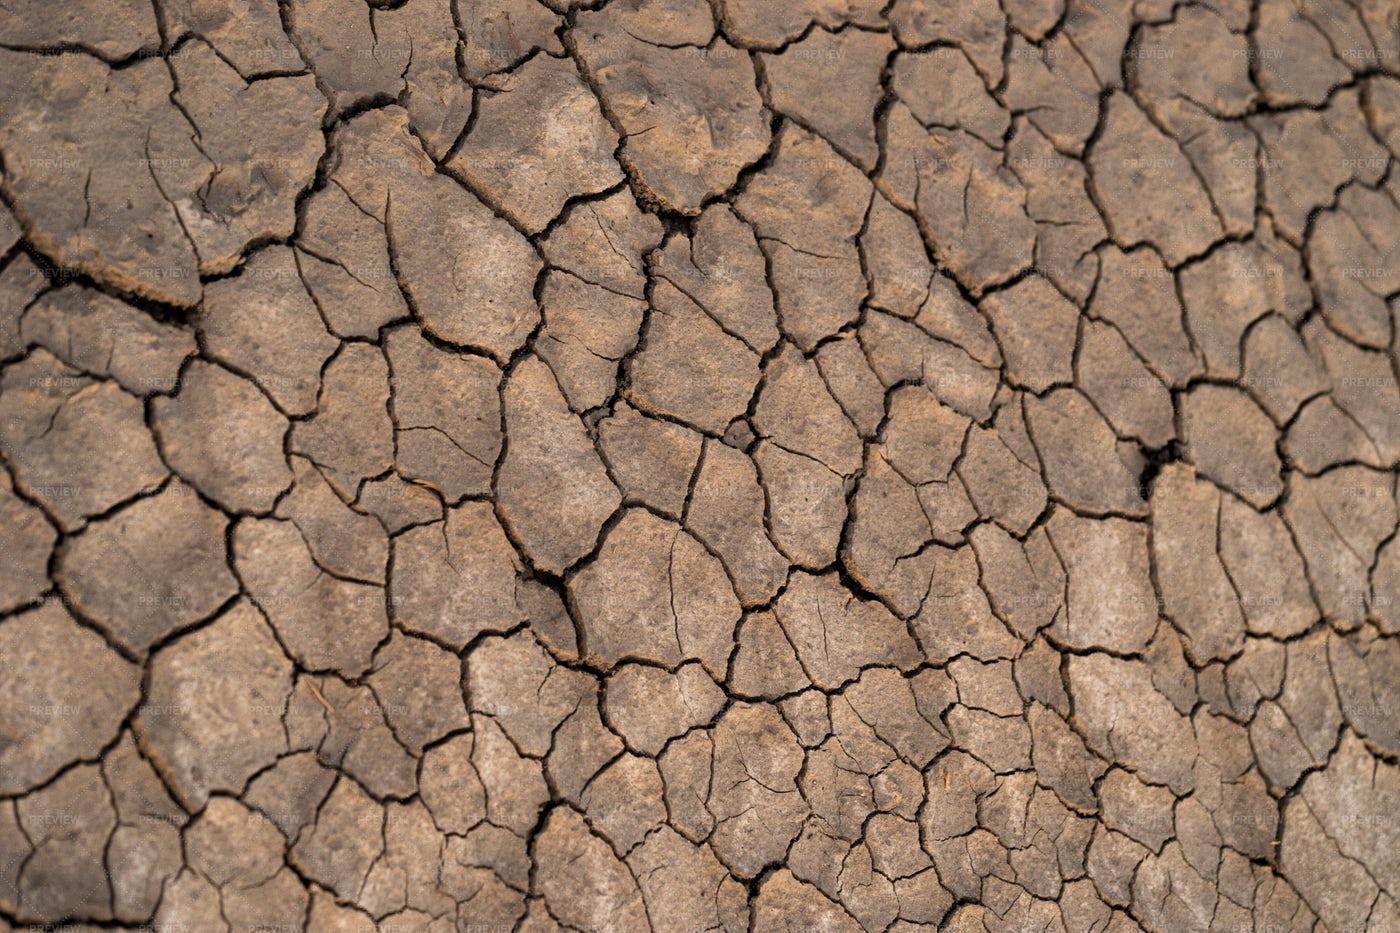 Many Cracks In The Soil: Stock Photos